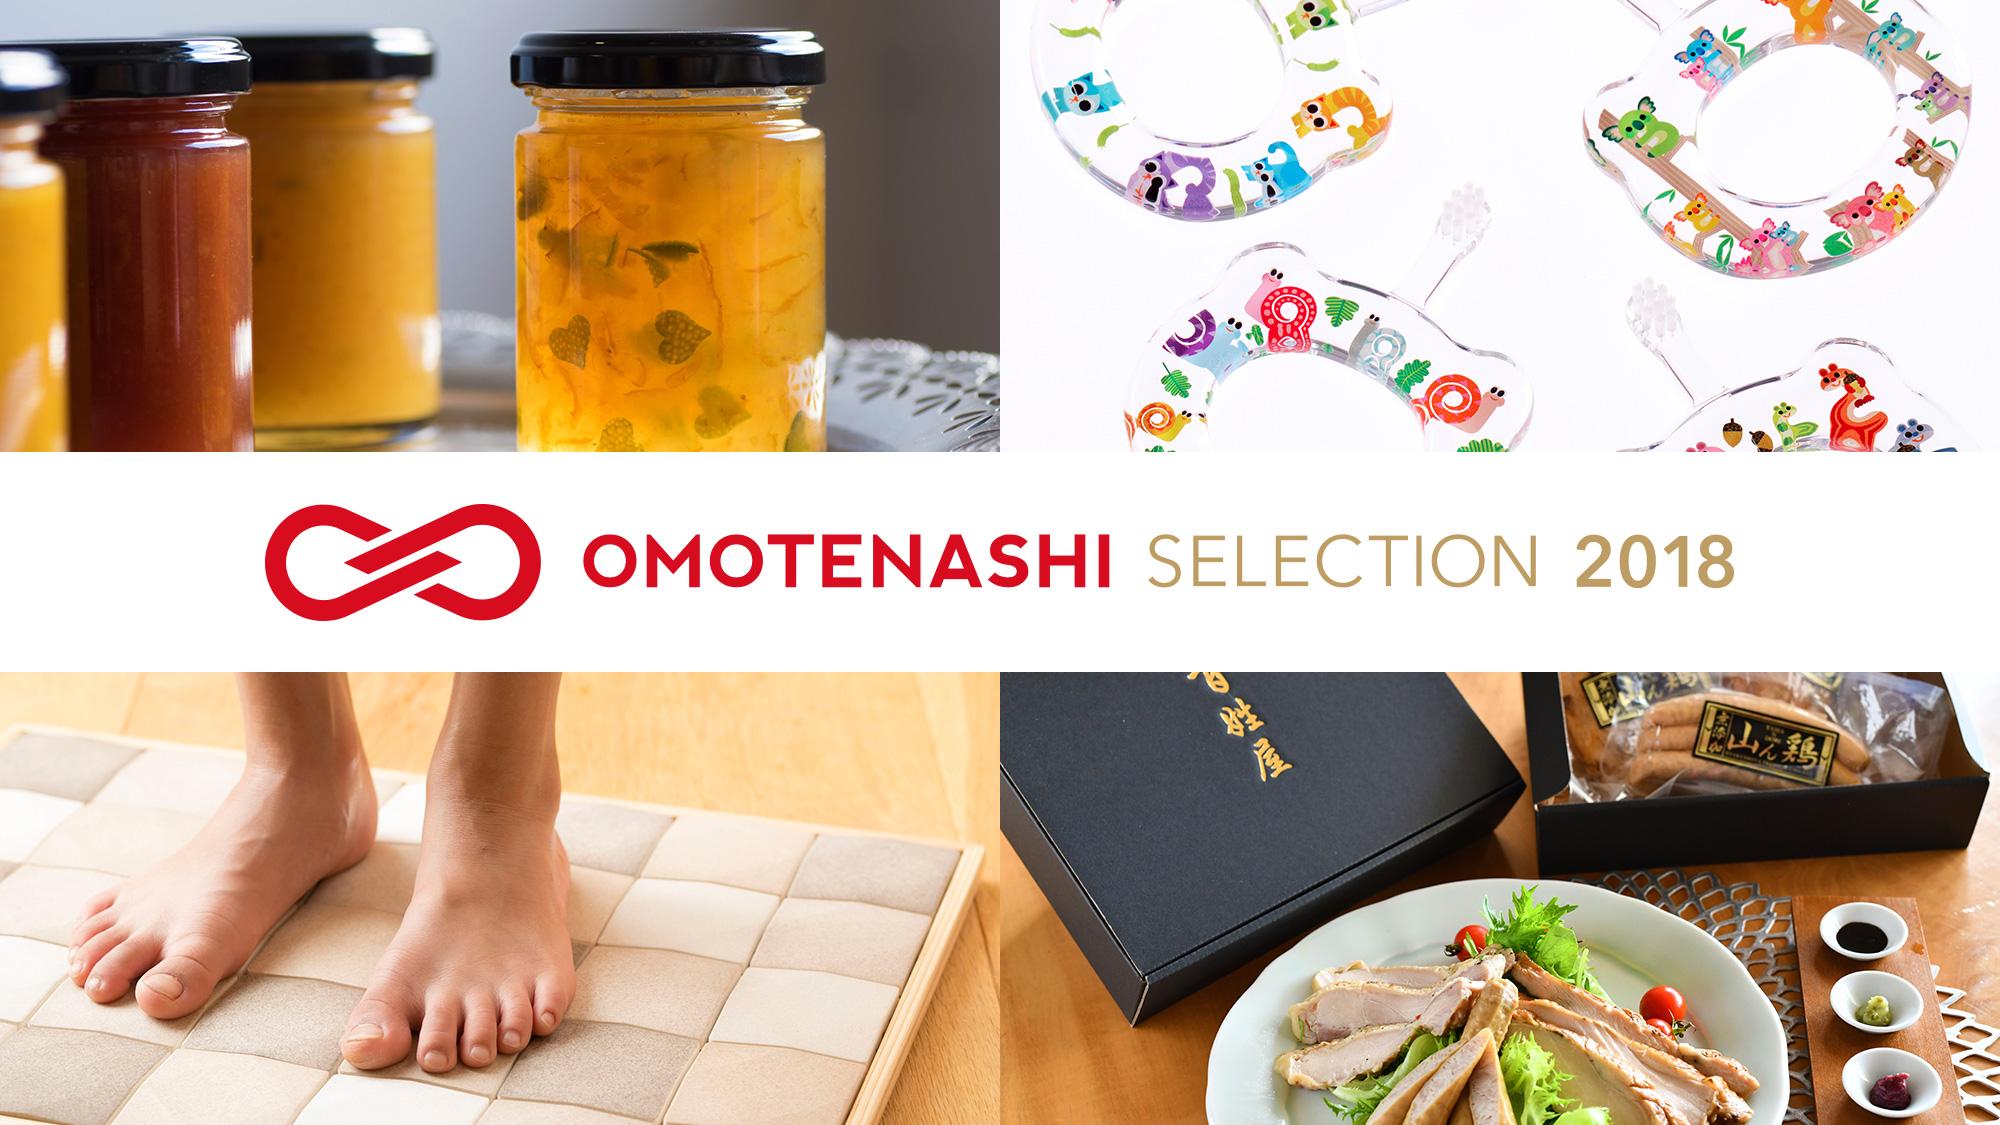 「OMOTENASHI Selection 2018」第2期 商品部門の受賞商品発表!!